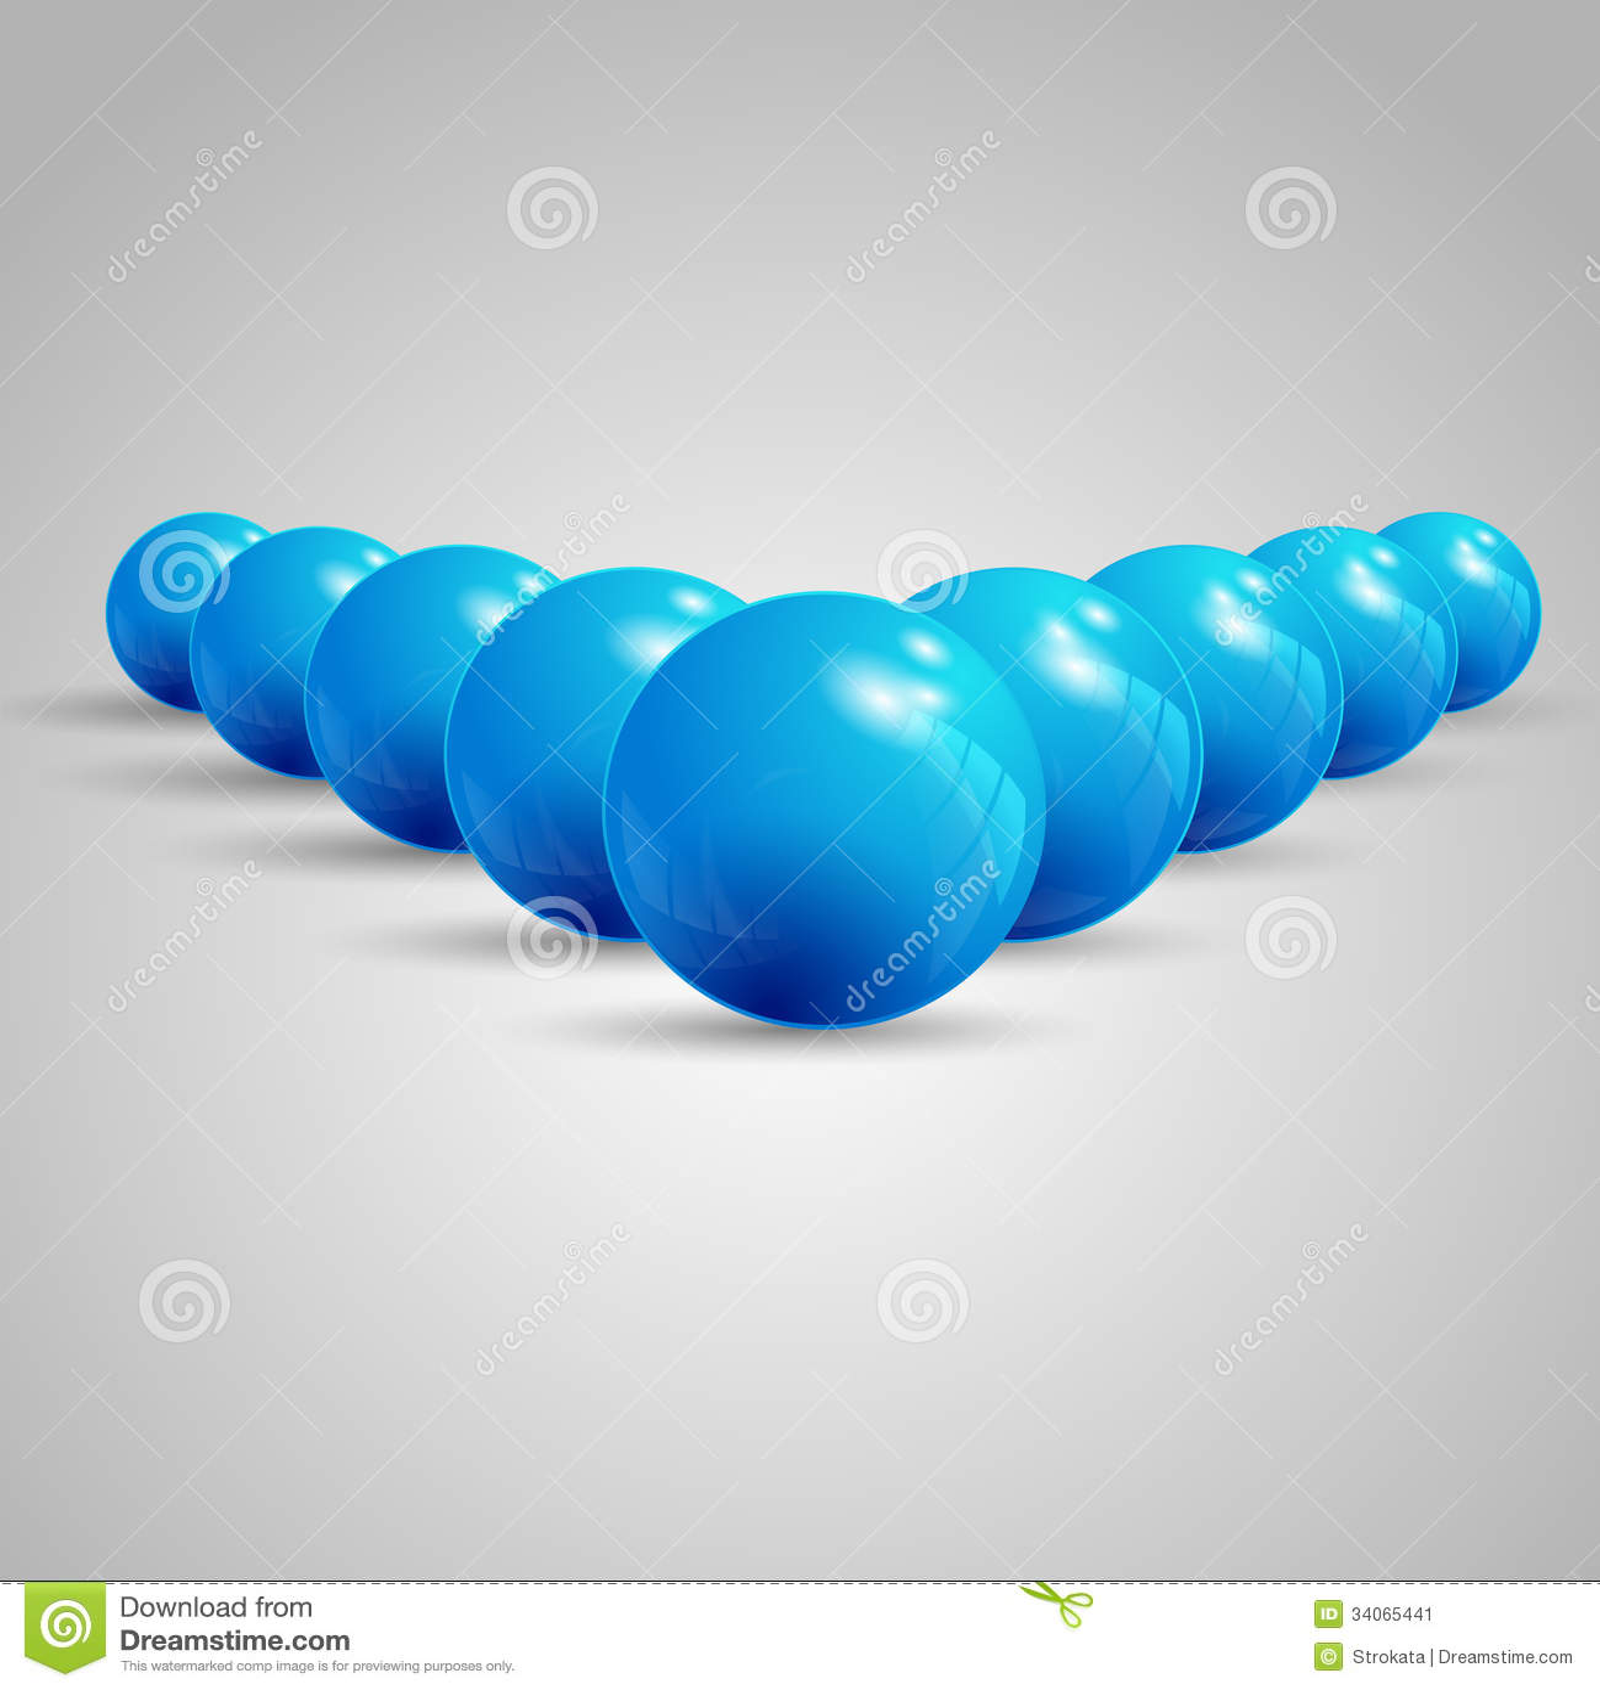 Pointing balls, balls pointing ahead, set of balls